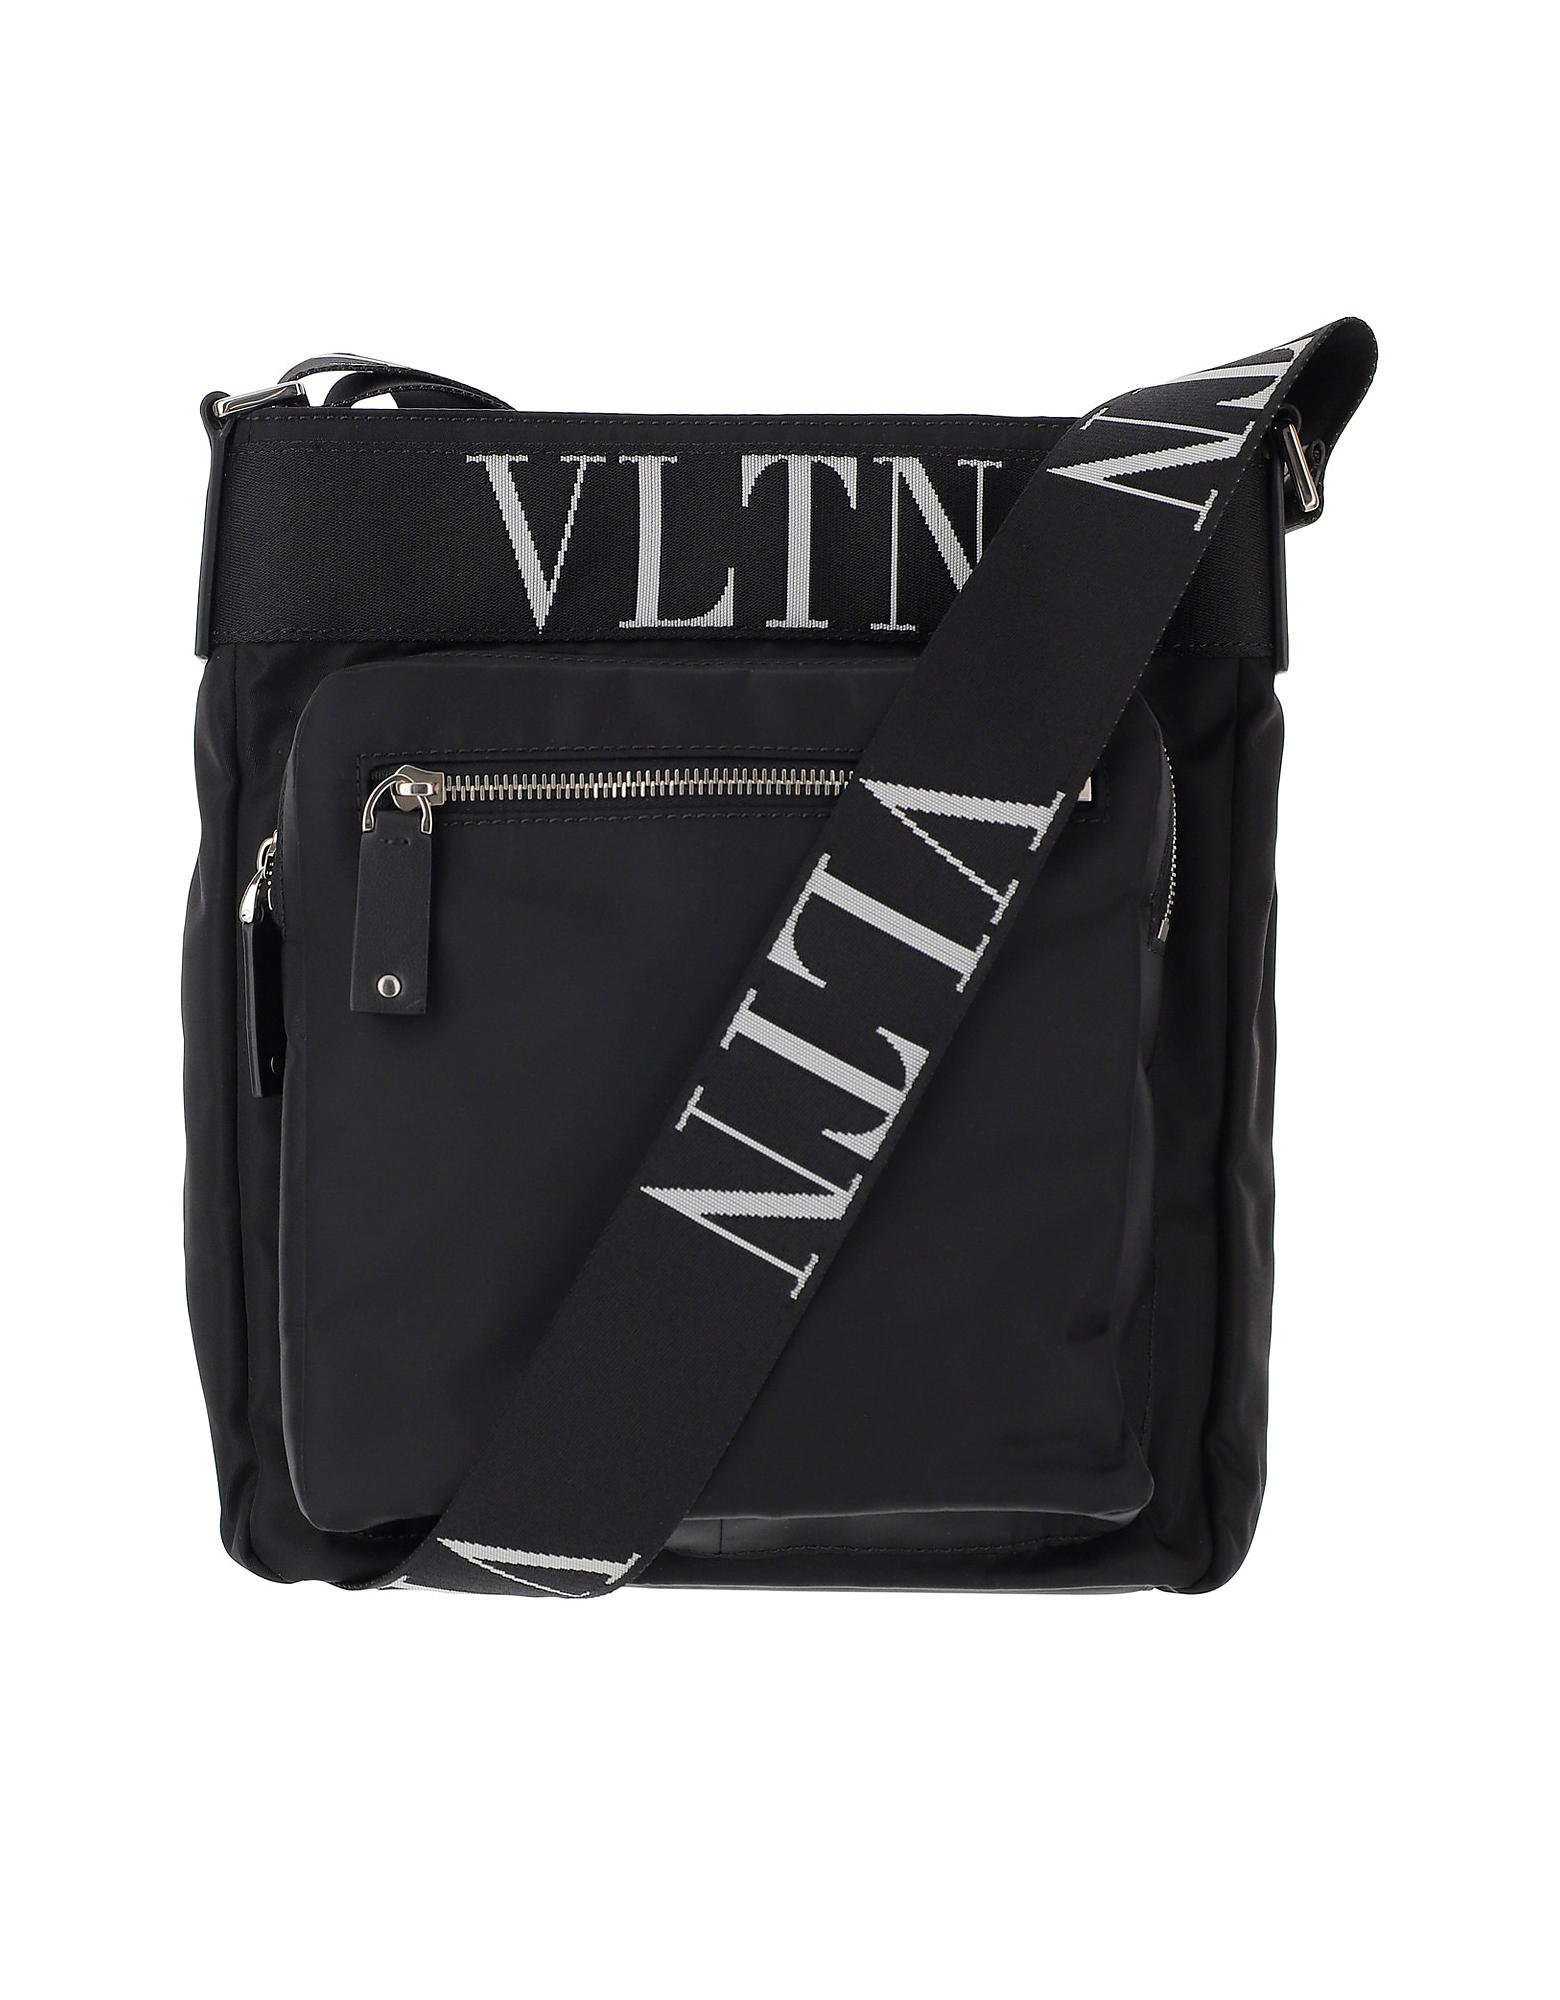 Valentino Designer Men's Bags, Black Nylon Crossbody Bag